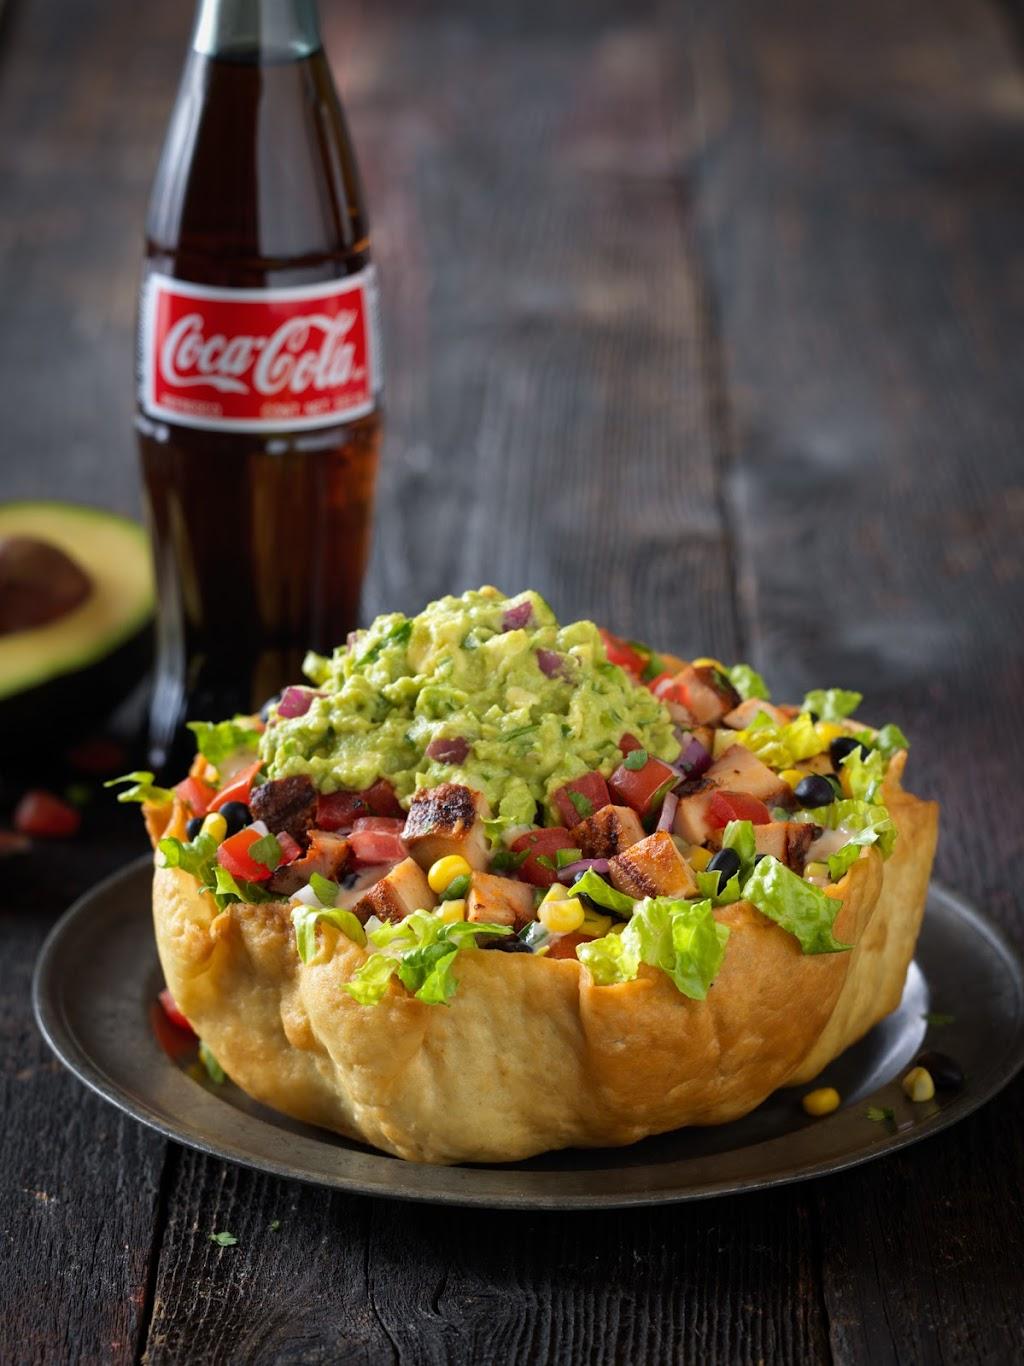 QDOBA Mexican Eats - restaurant  | Photo 7 of 10 | Address: 8286 Northfield Blvd Suite 1510, Denver, CO 80238, USA | Phone: (303) 286-7337